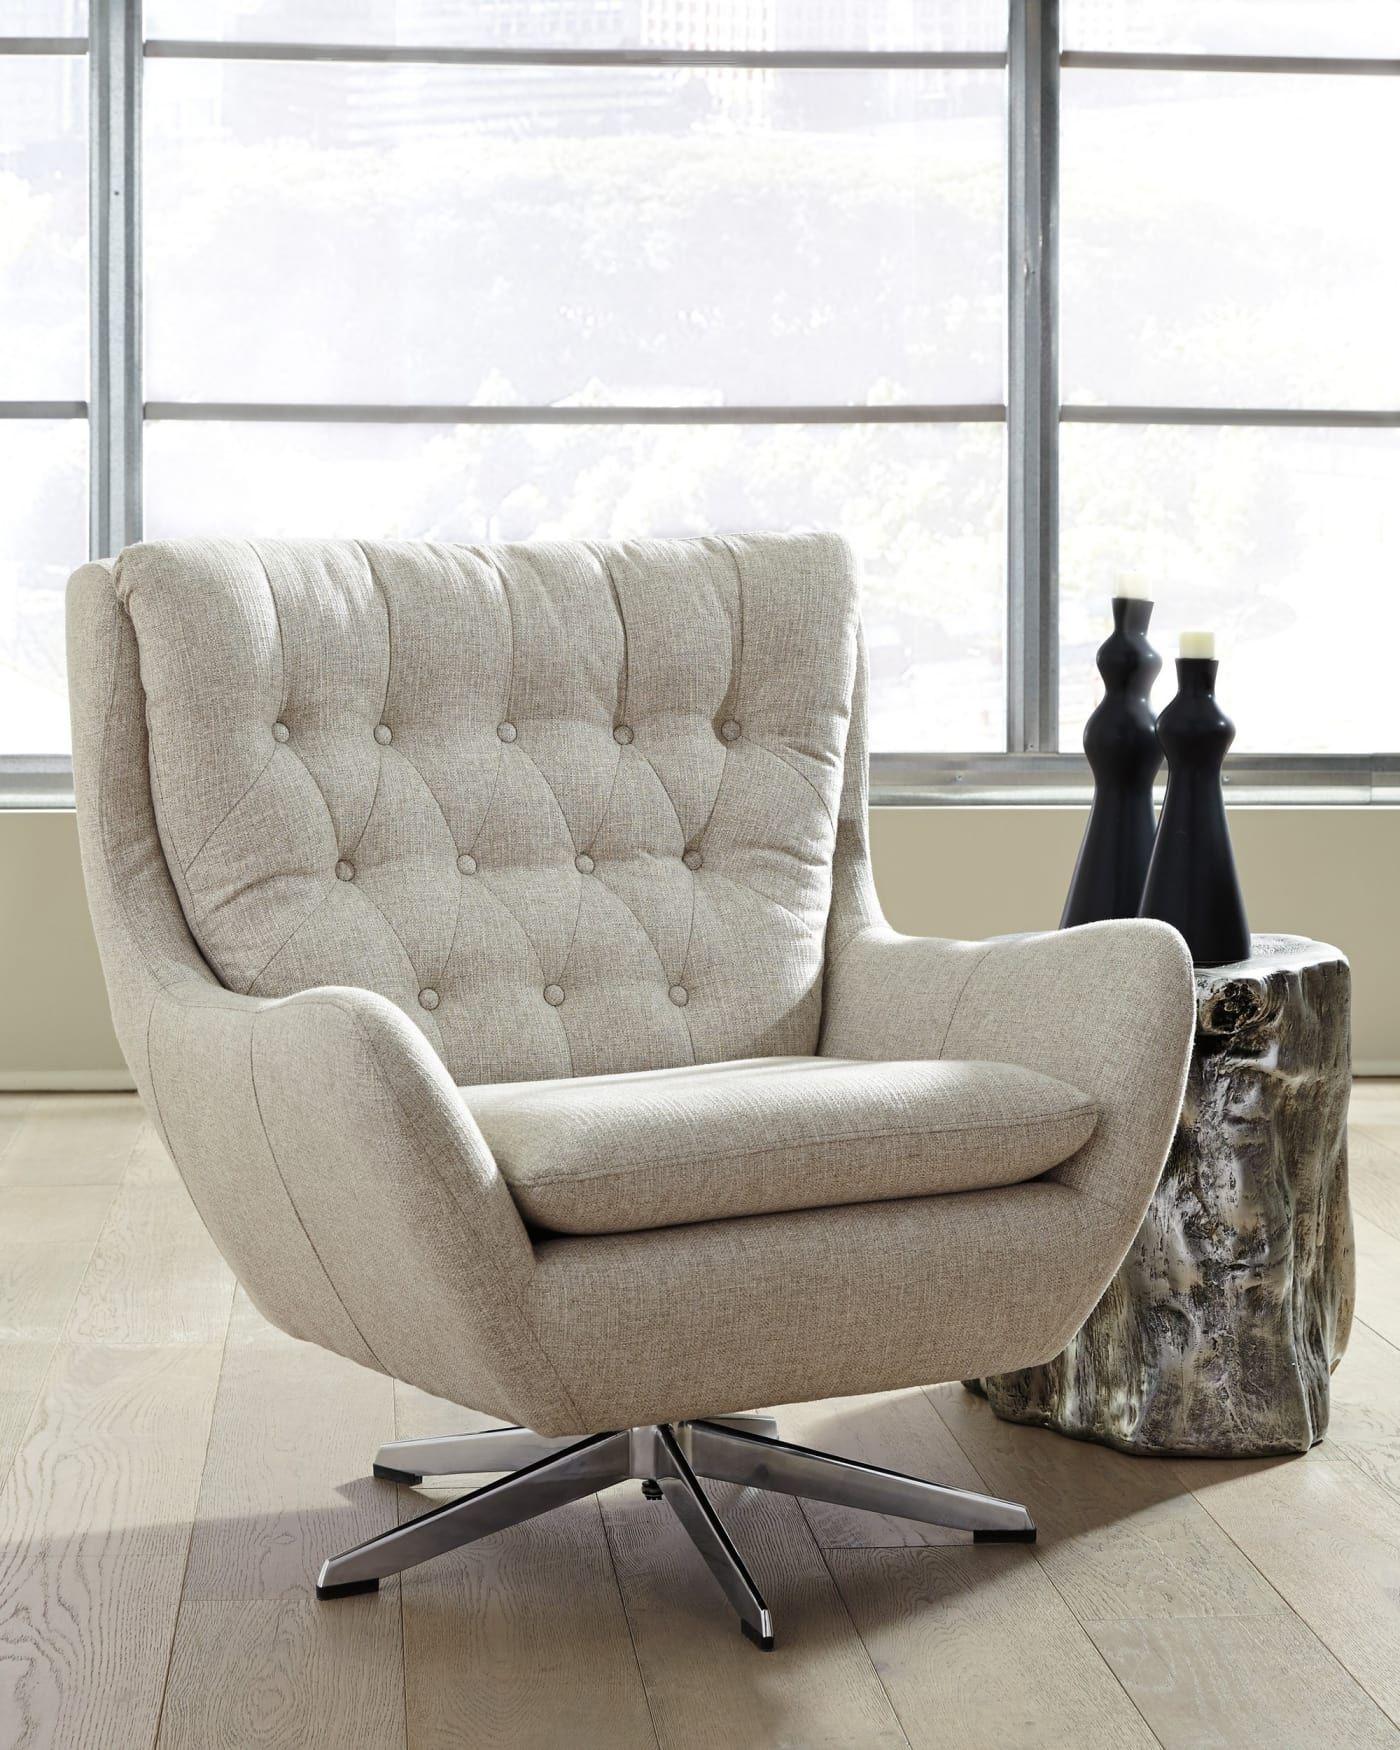 SignatureDesignA3000095 Furniture, Chair, Accent chairs